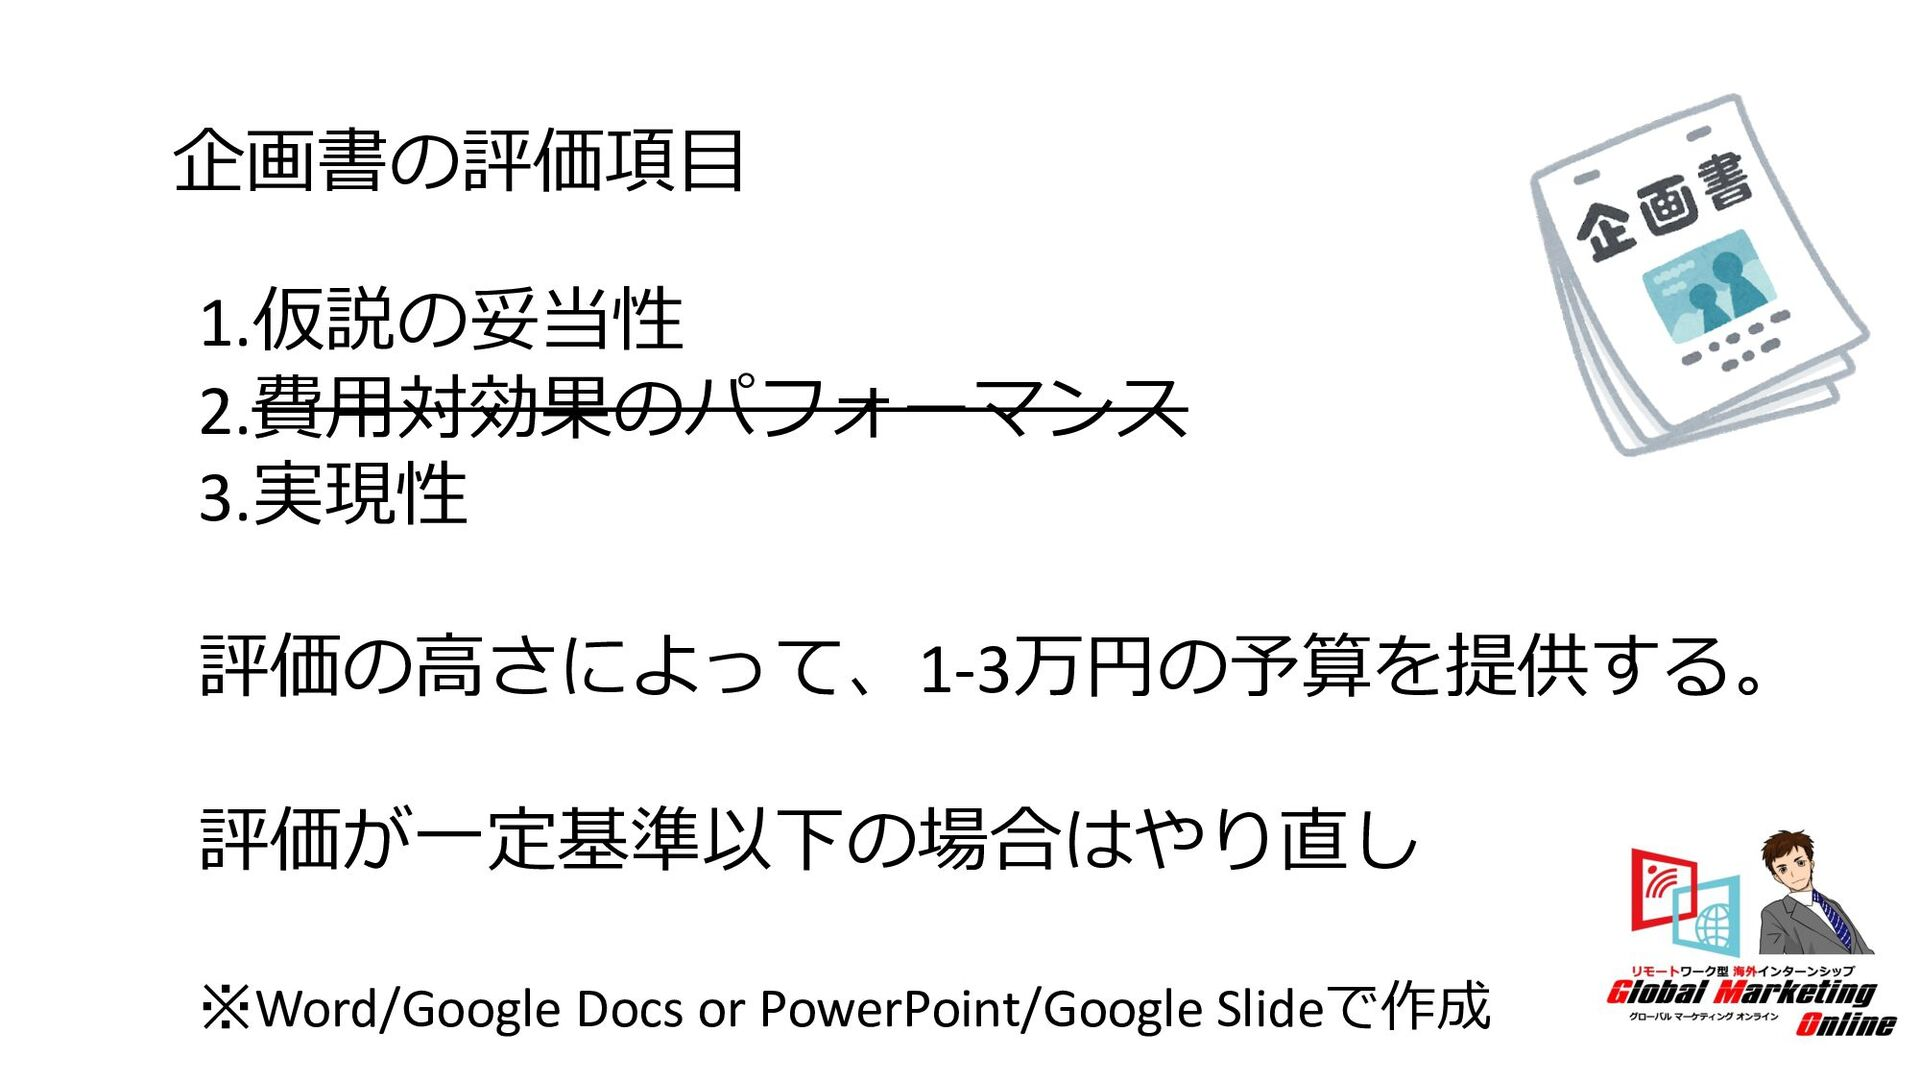 1.Facebook,Instagram広告 Global Marketing Onlineの...